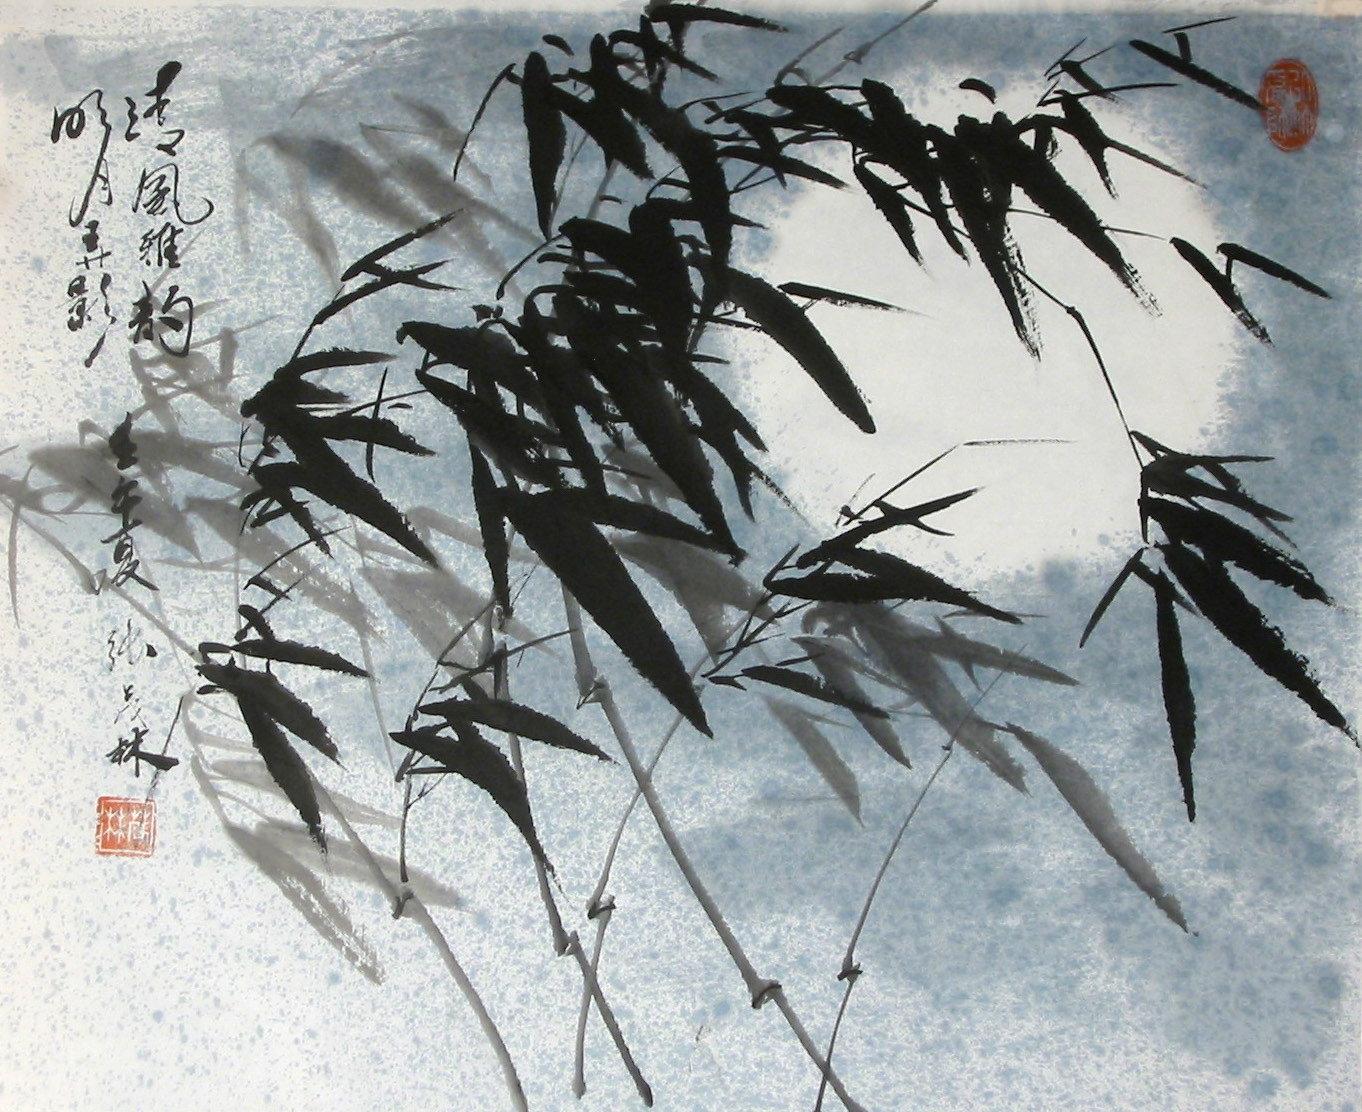 13bamboo_QingFengYaYun-under-moon_2002.jpg